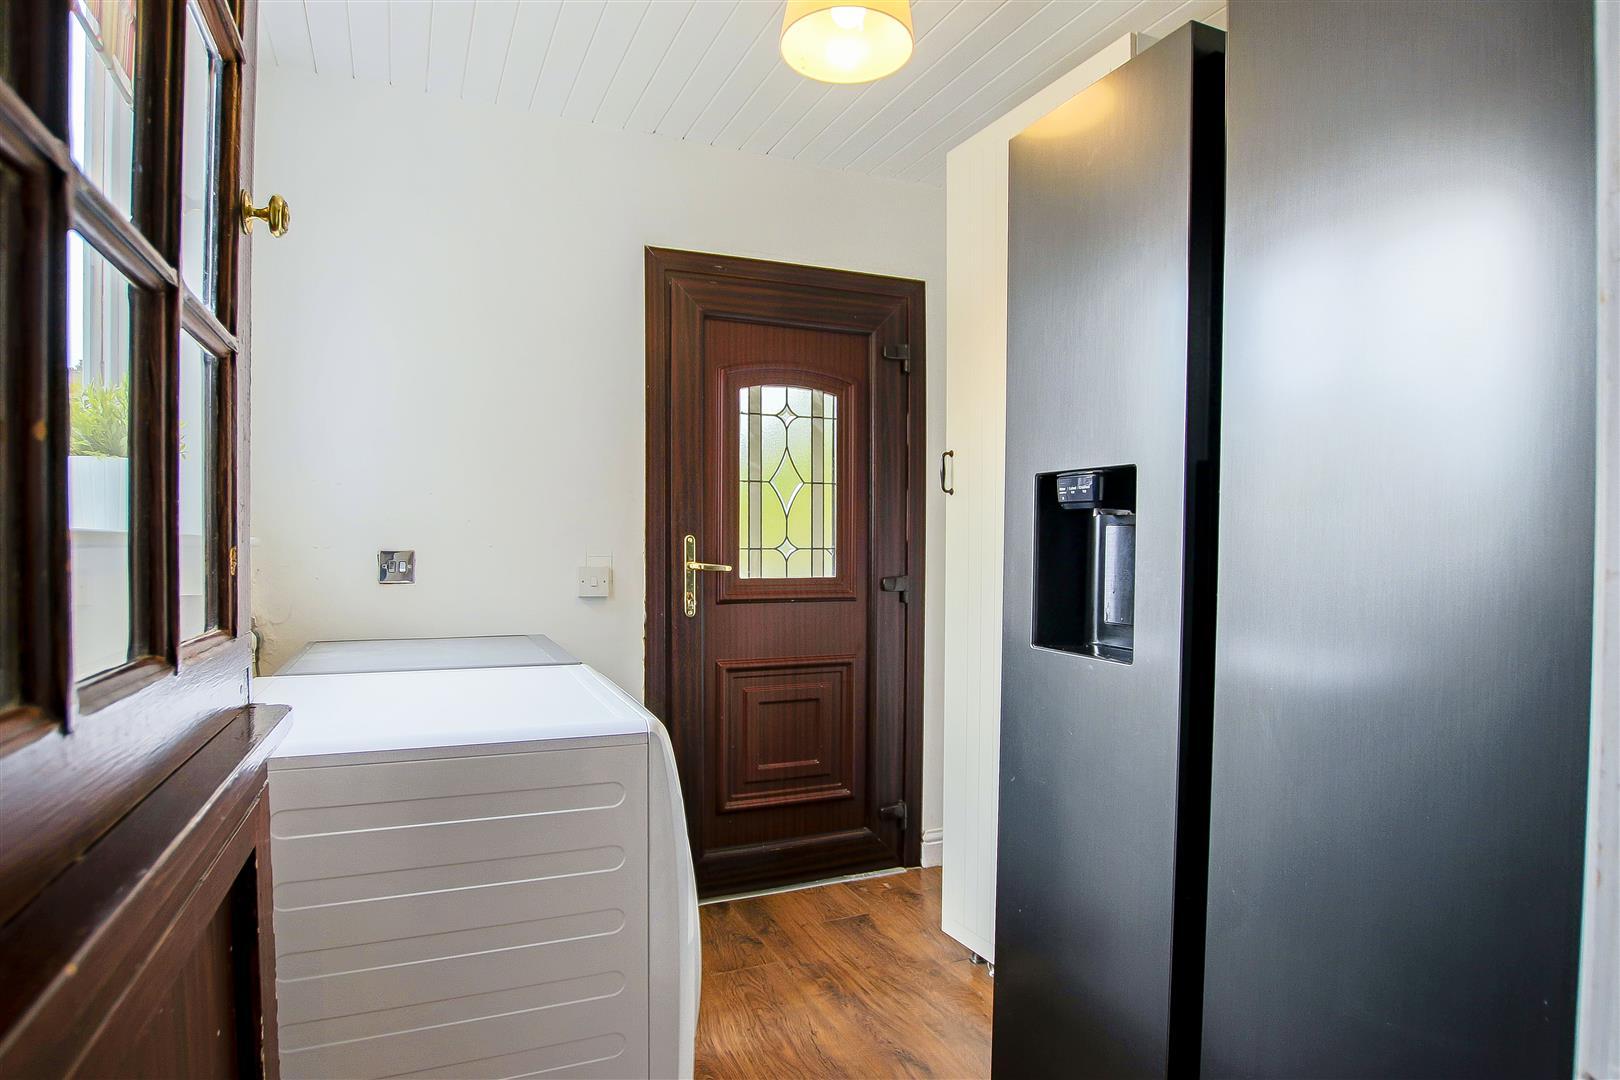 4 Bedroom Semi-detached House For Sale - 40.jpg